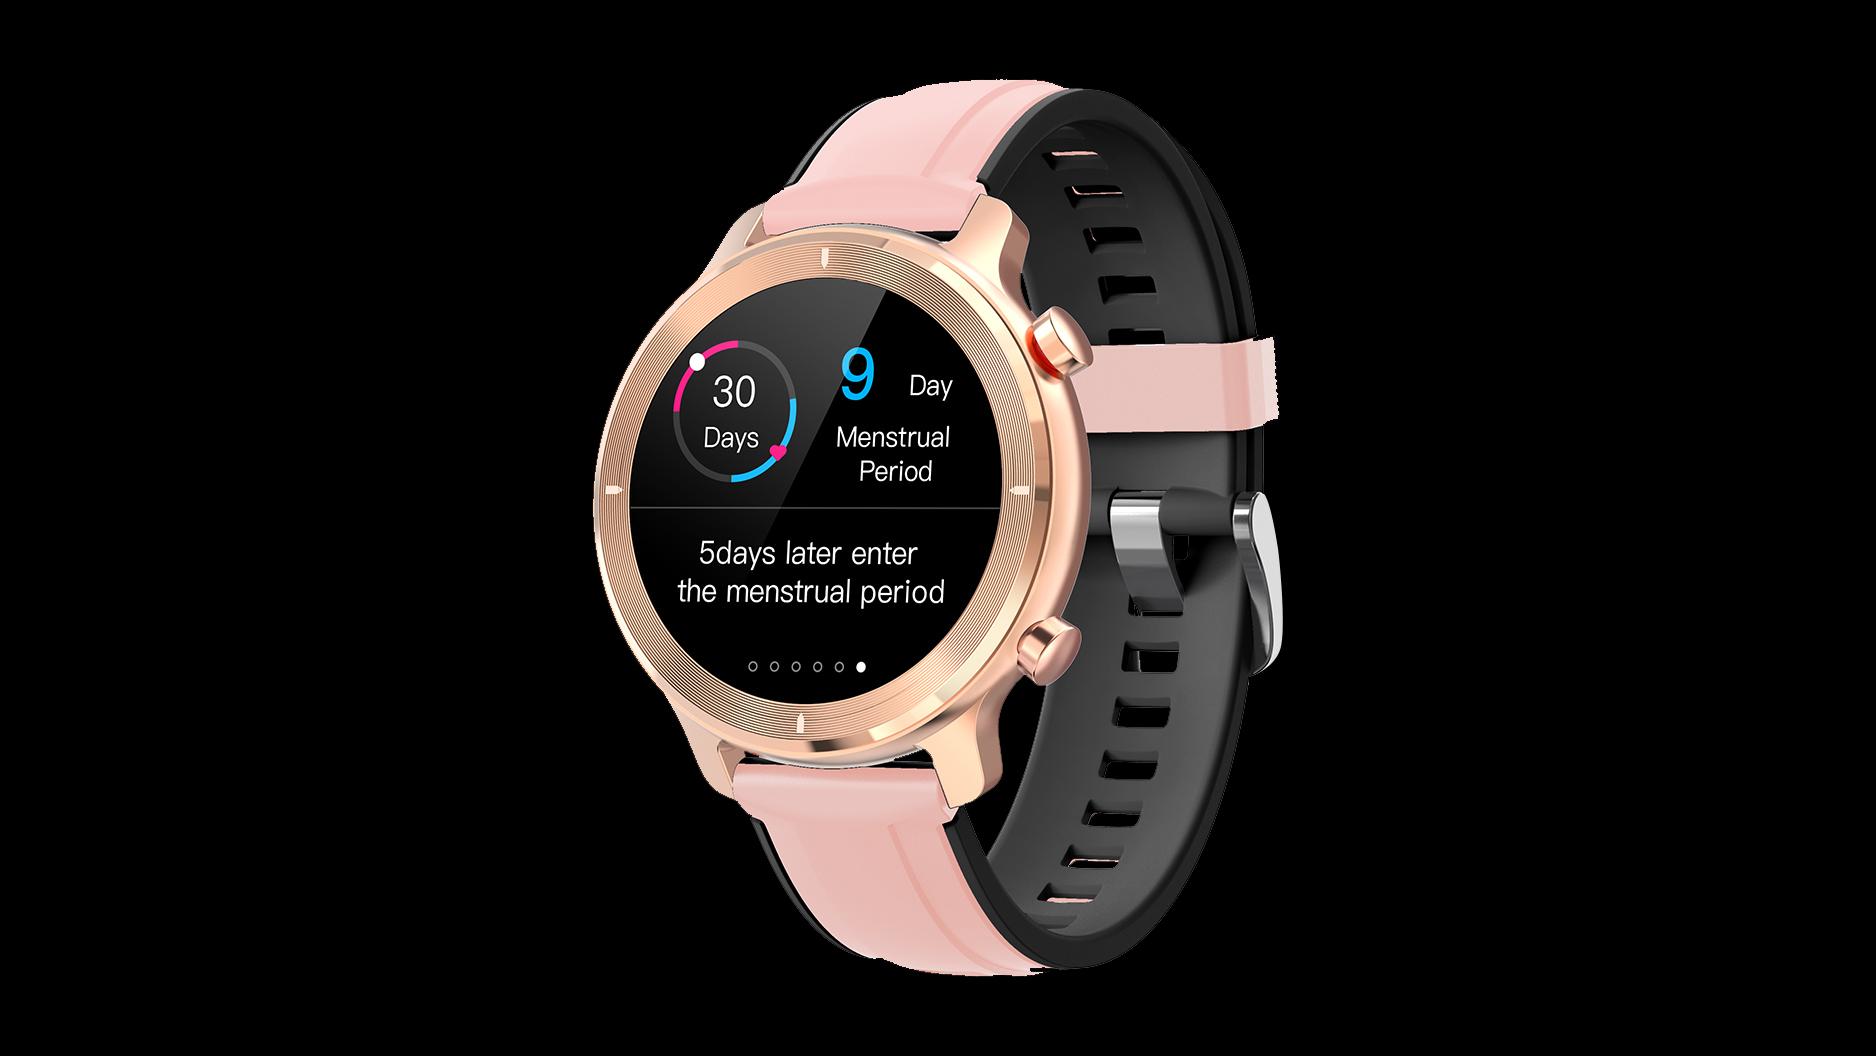 स्मार्ट wristband ip68 निविड़ अंधकार मासिक धर्म अनुस्मारक हृदय गति मॉनिटर पुरुष और महिला bt5.0 स्मार्टवॉच आर 4